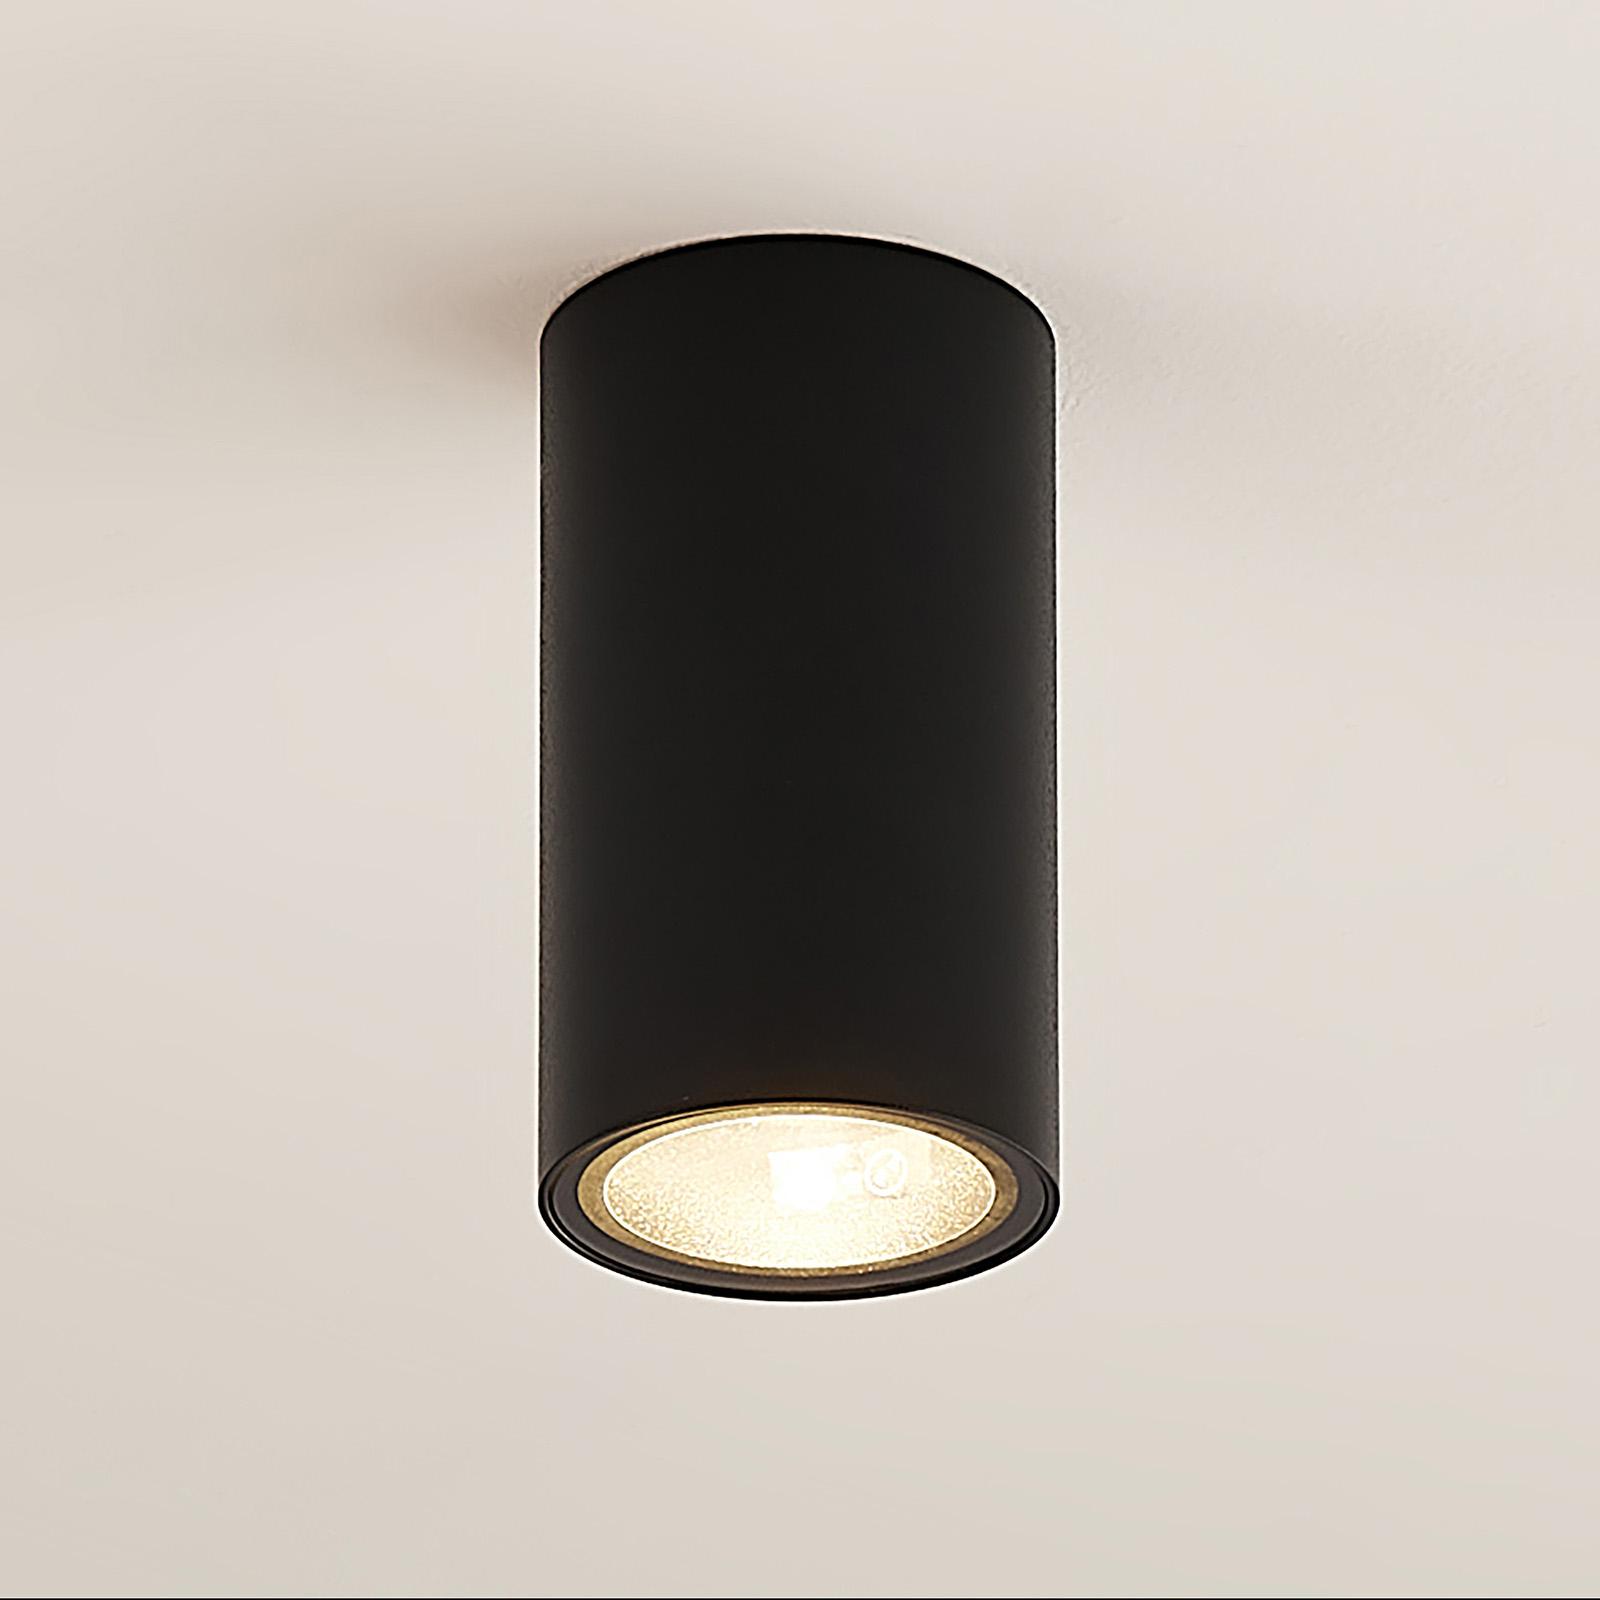 Arcchio Olivir downlight, okrągły, GU10, czarny